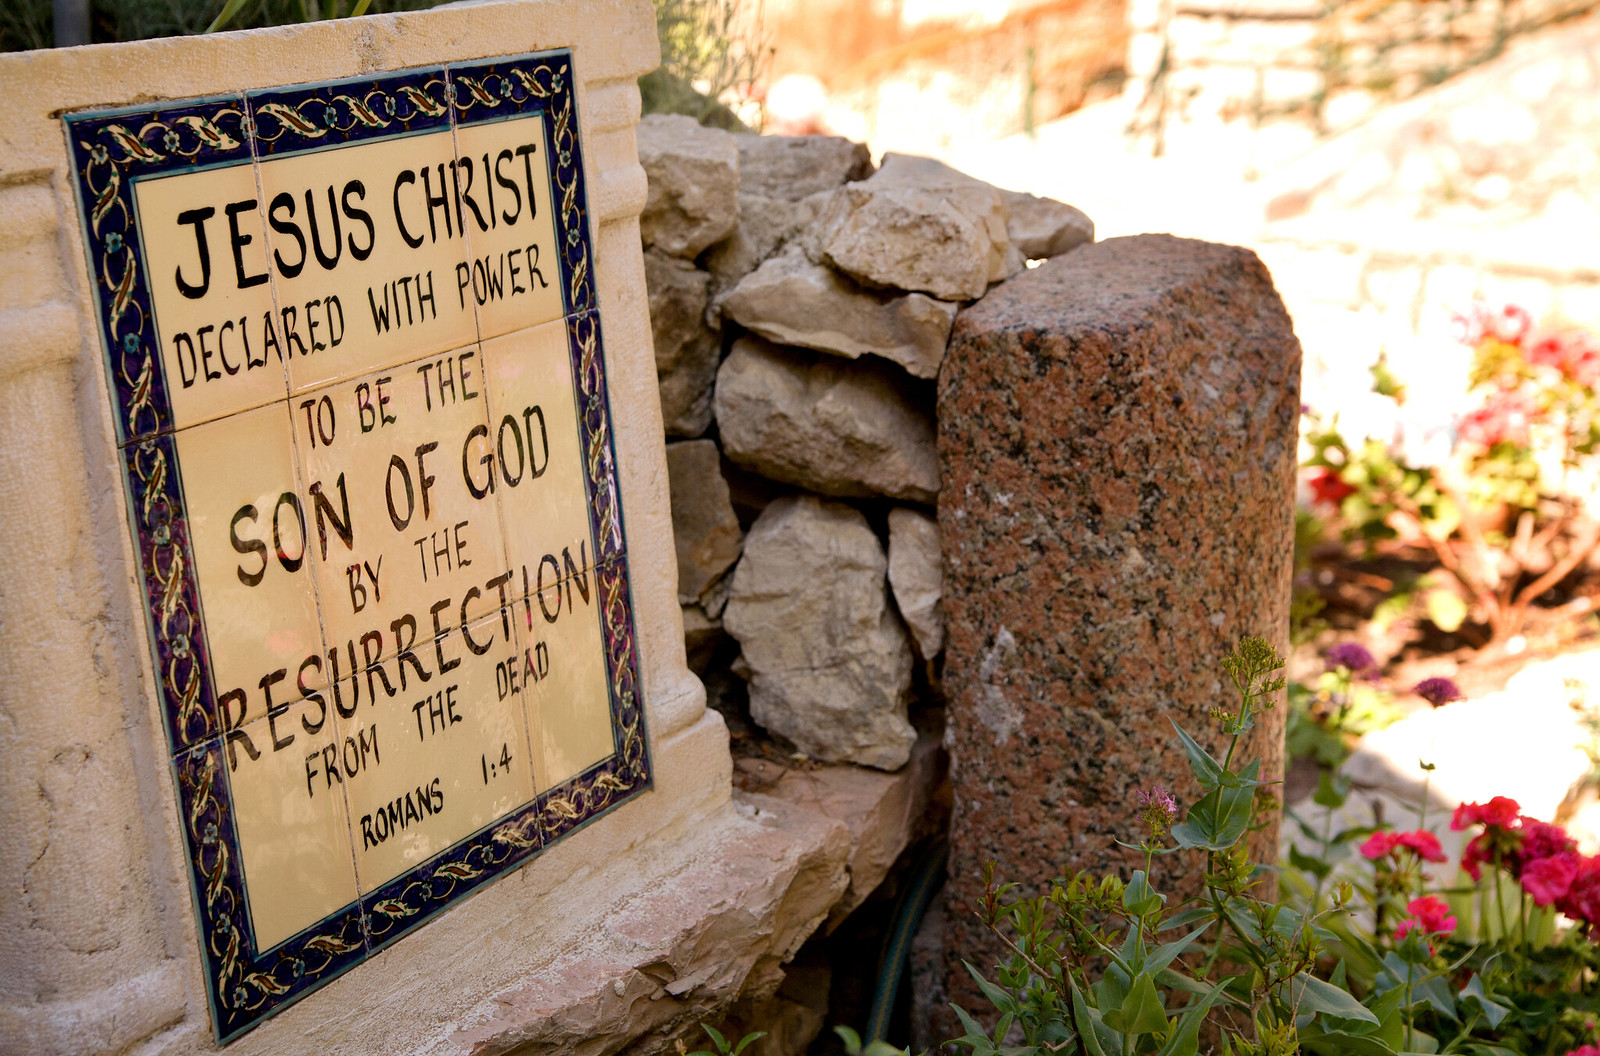 Jerusalem_Garden Tomb 4_Noam Chen_IMOT